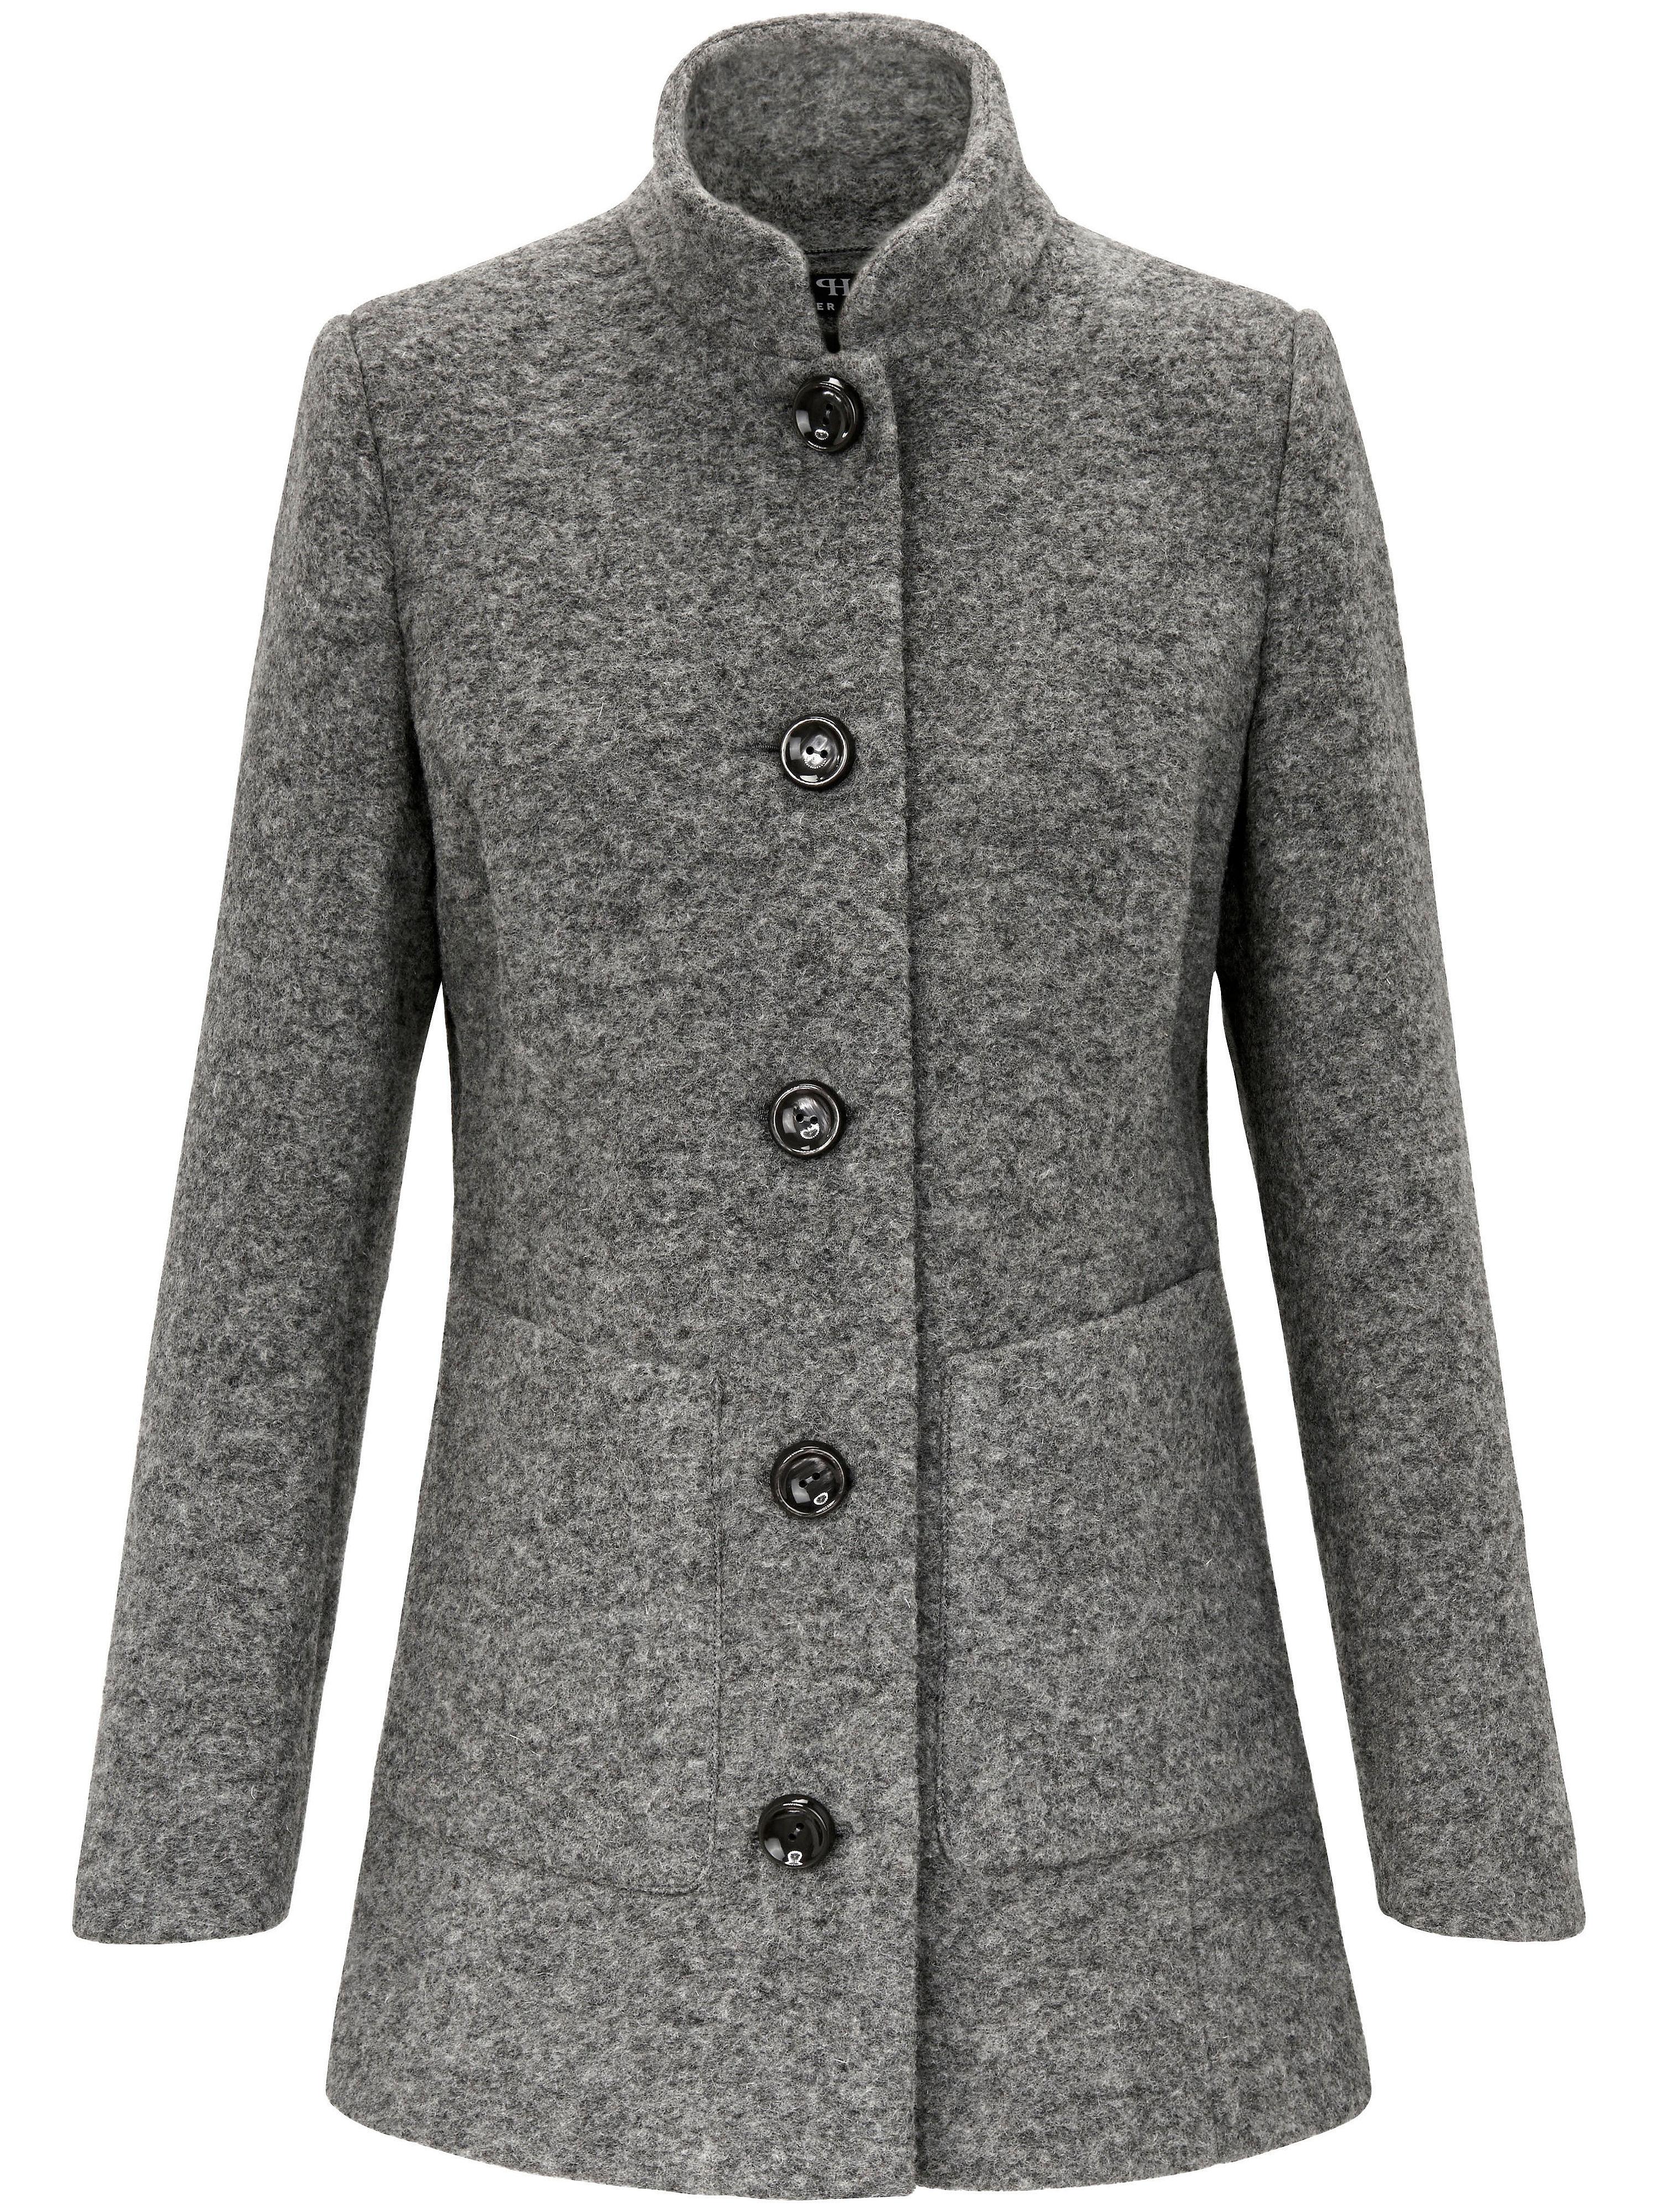 Image of   Jakke i 100% uld Fra Peter Hahn grå